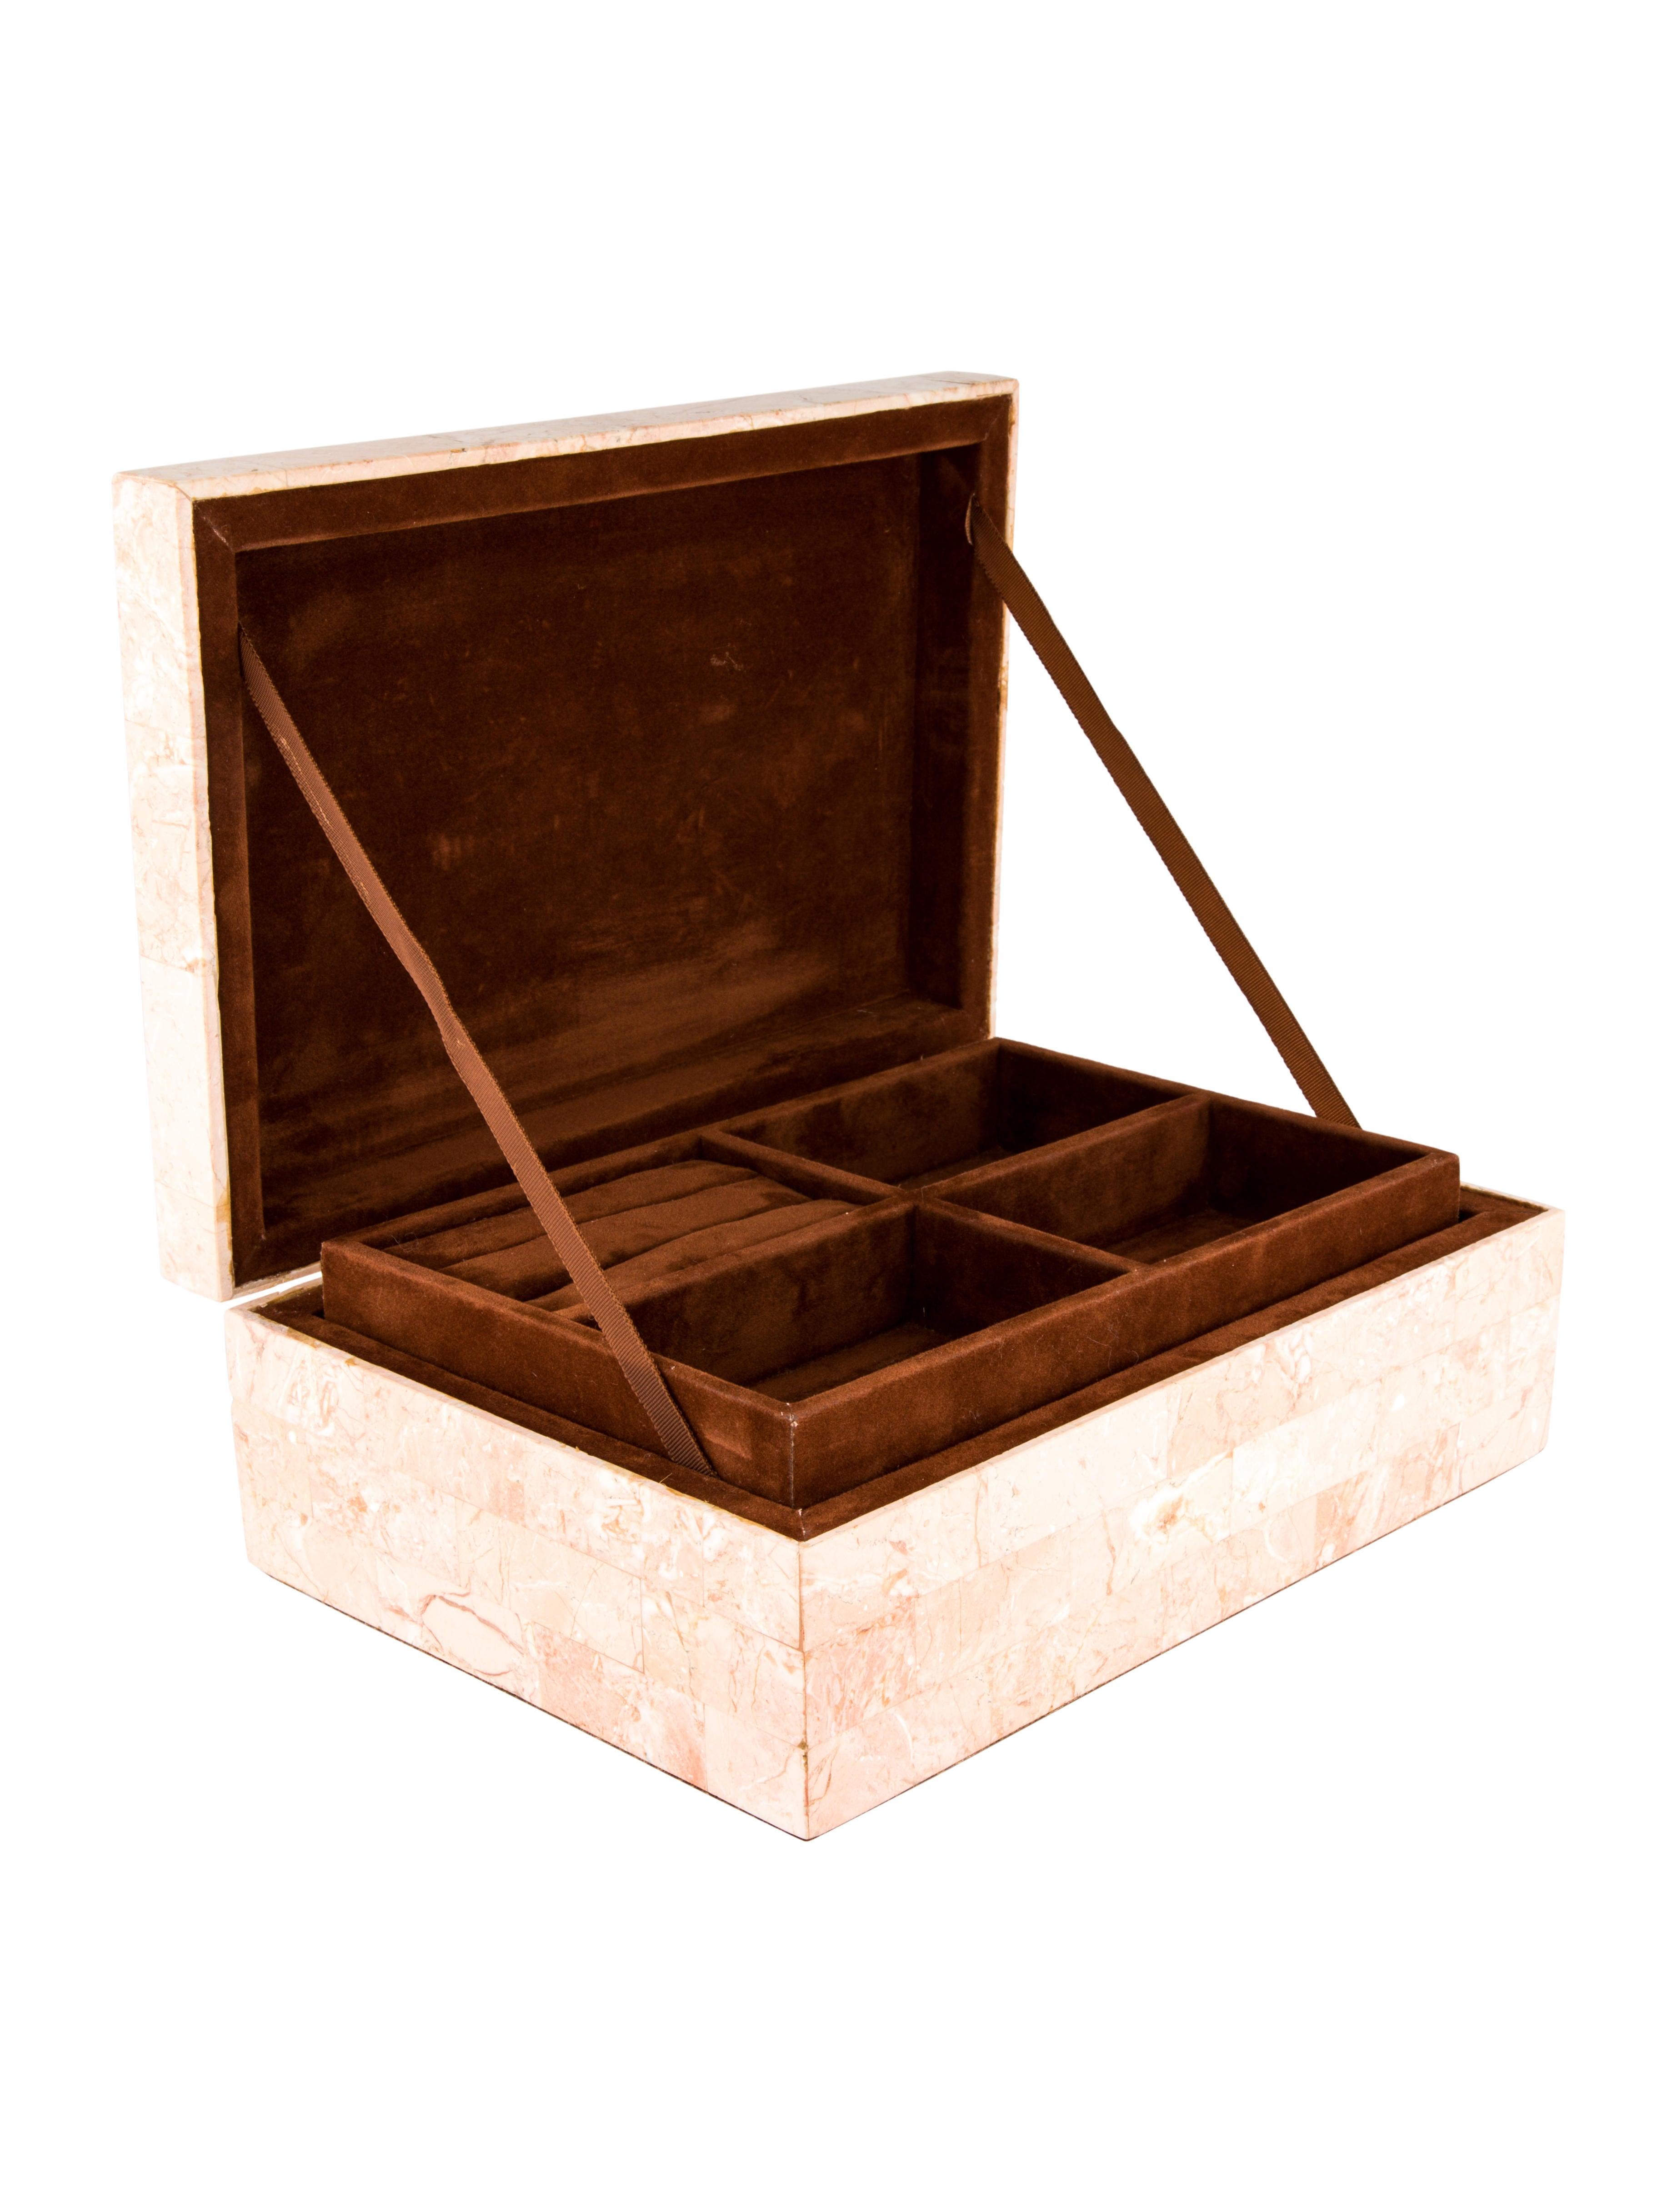 Marble Jewelry Box Decor And Accessories Jelbx20010